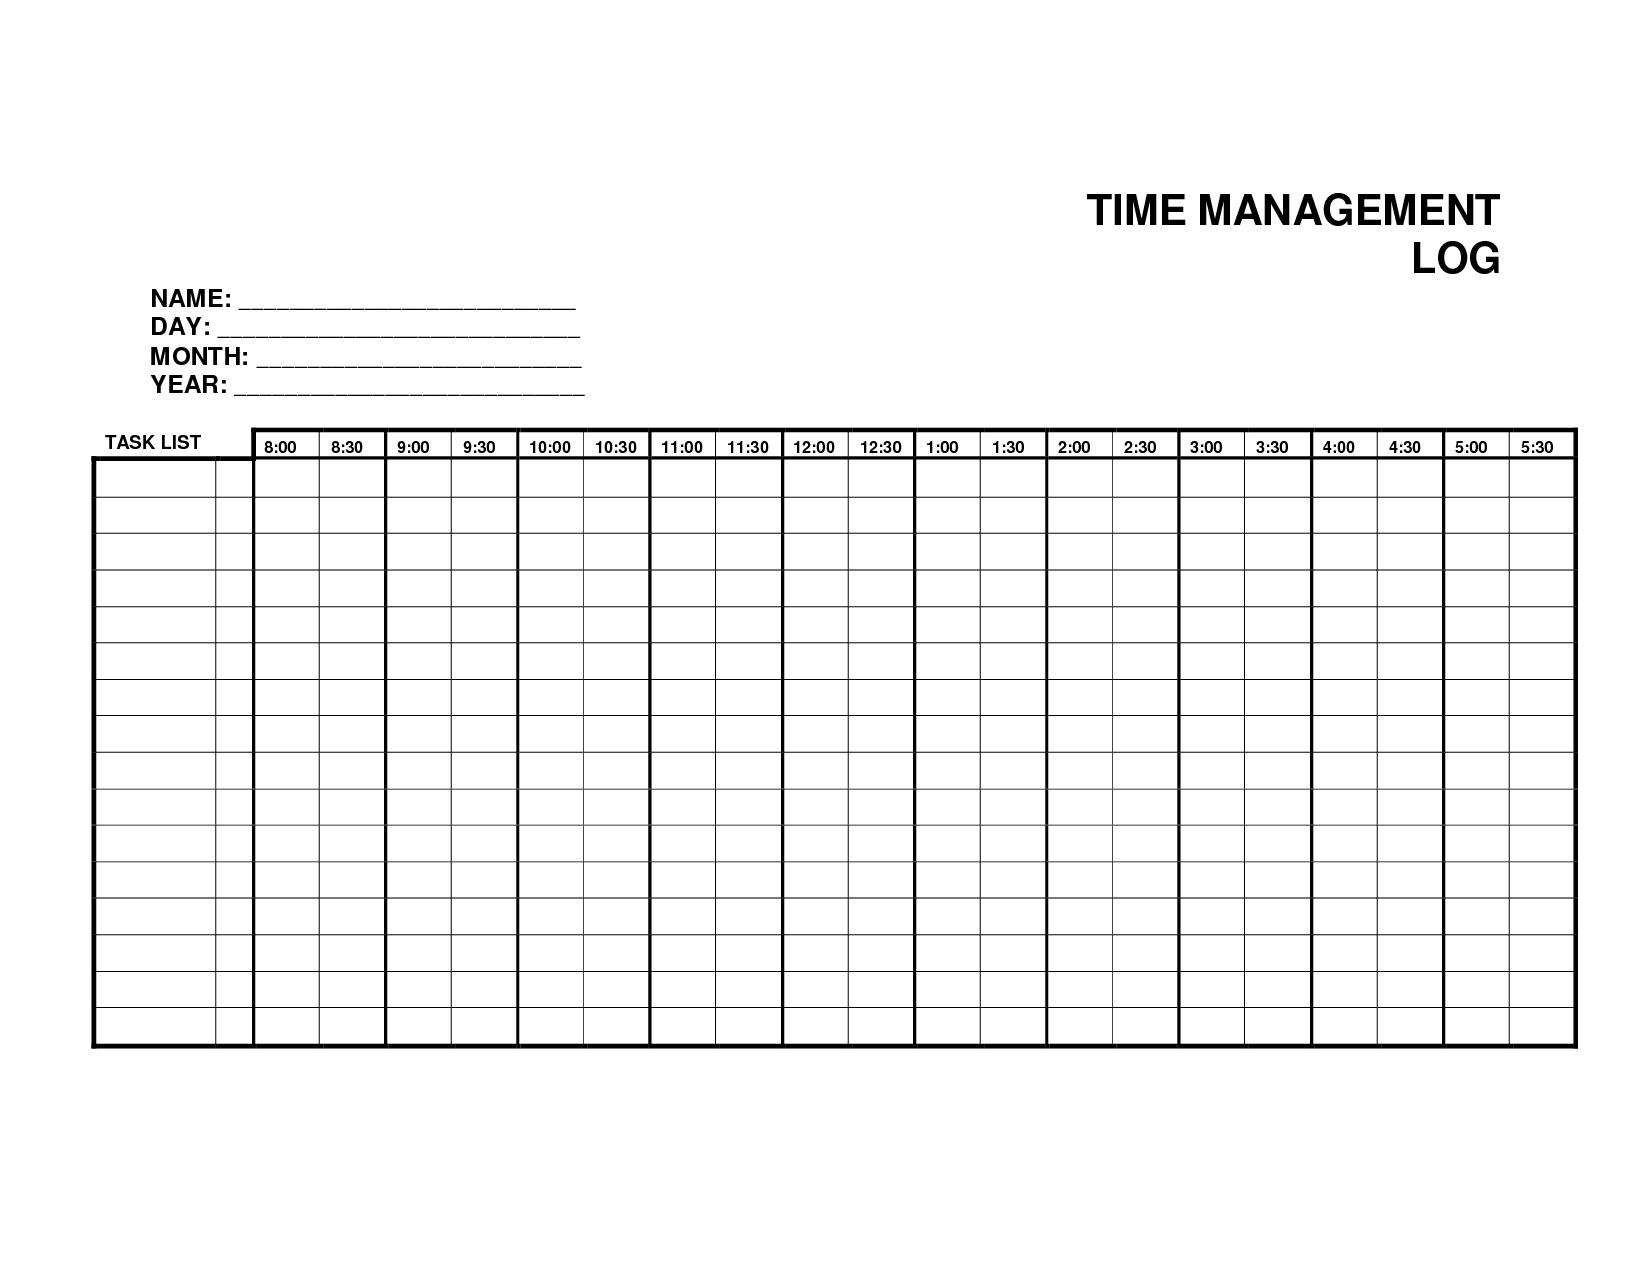 5 Log Sheet Templates